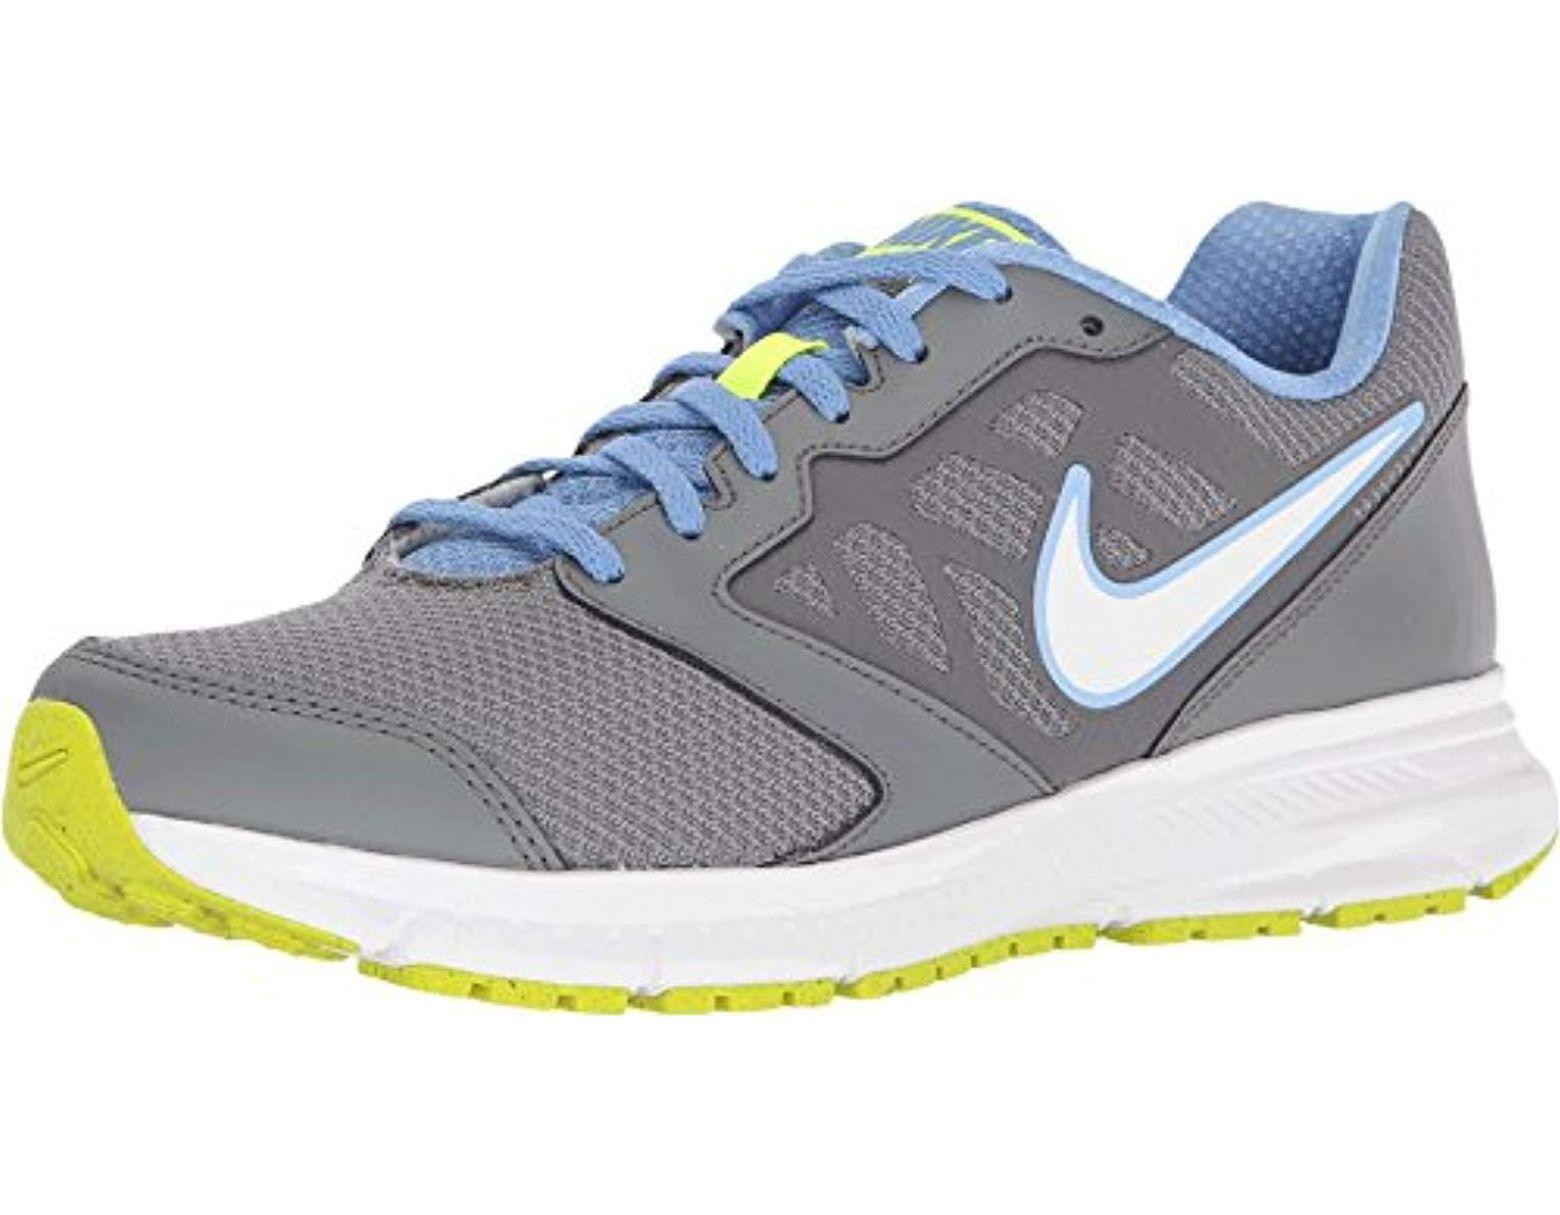 Nike downshifter 6 running shoes womens blueblack run